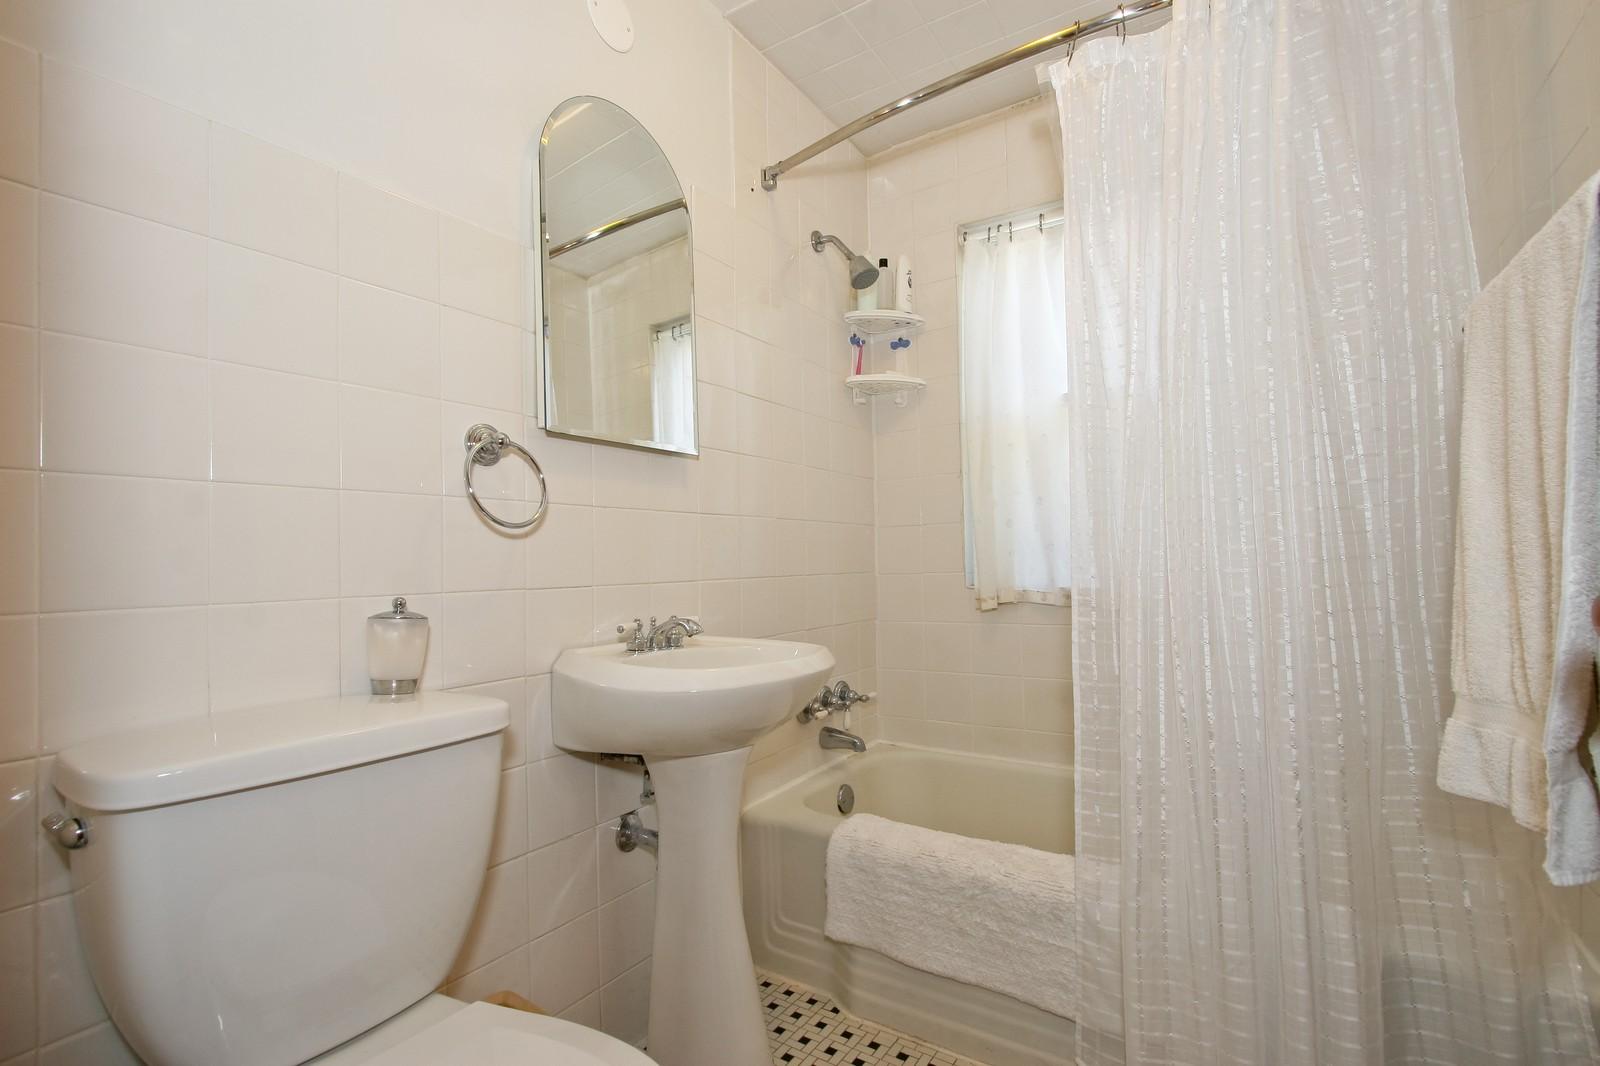 Real Estate Photography - 11246 S Avenue L, Chicago, IL, 60617 - Bathroom